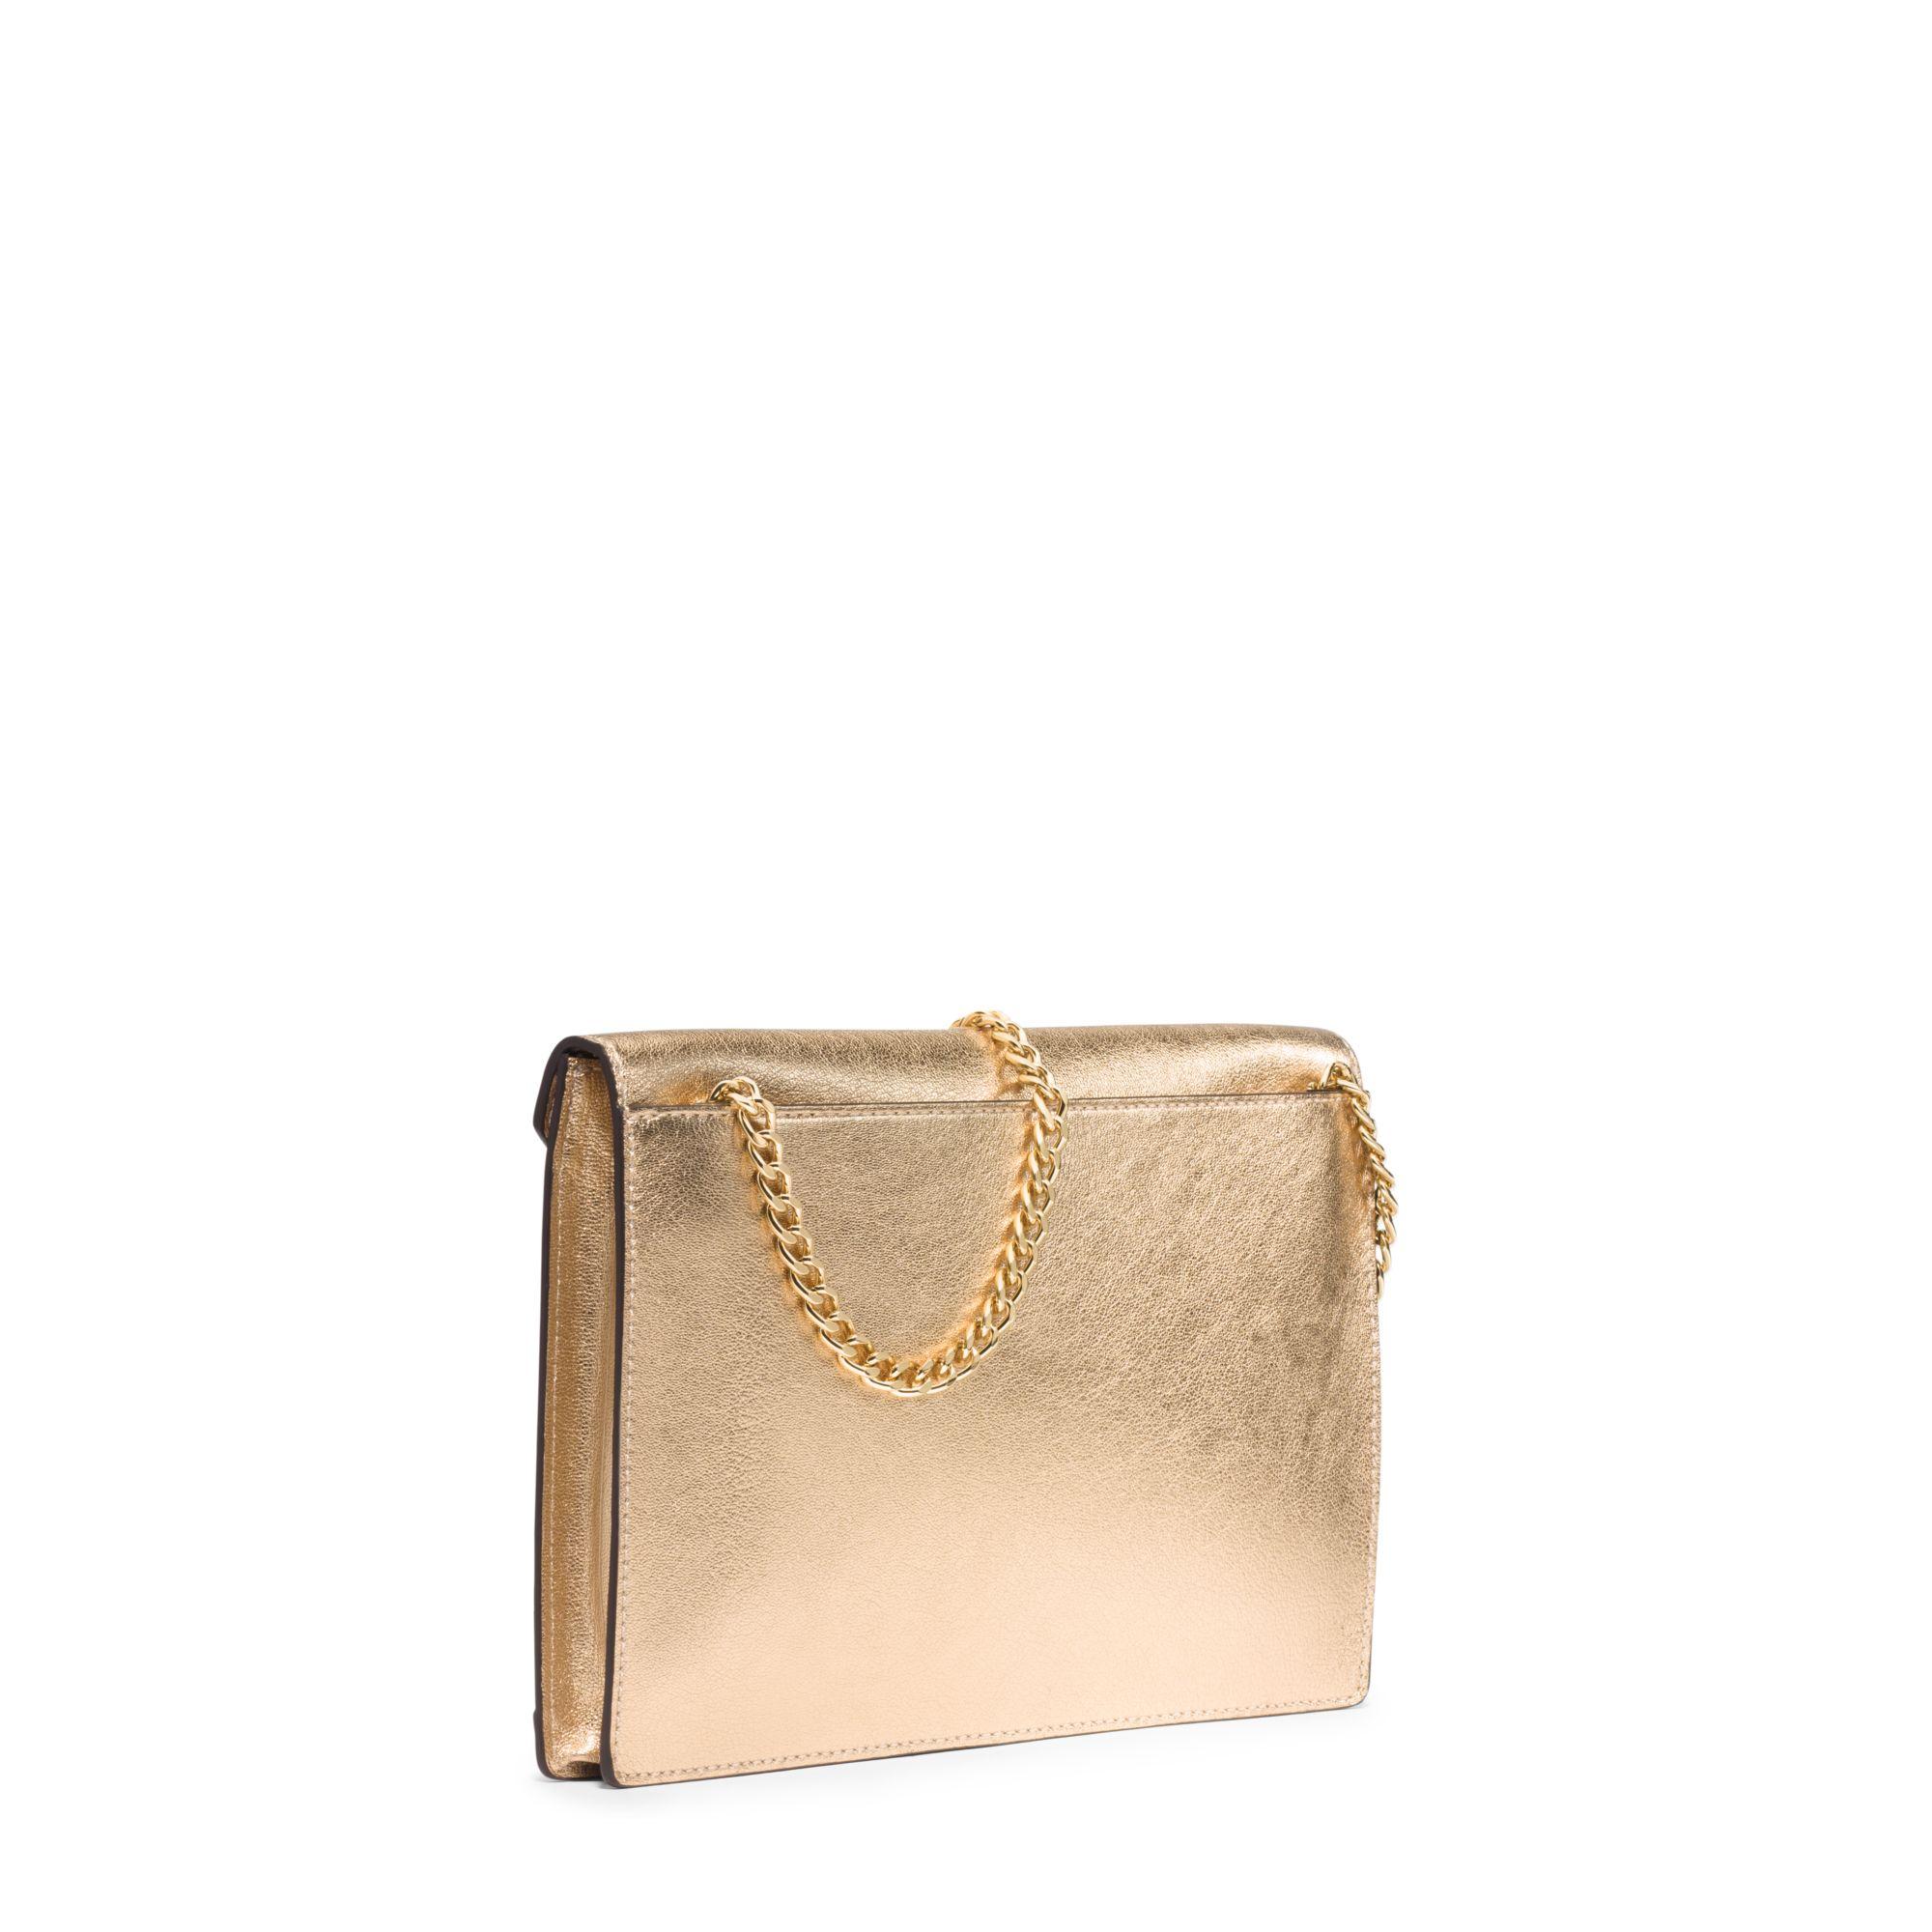 1d29c7738d3bab Michael Kors Lana Leather Envelope Clutch in Metallic - Lyst